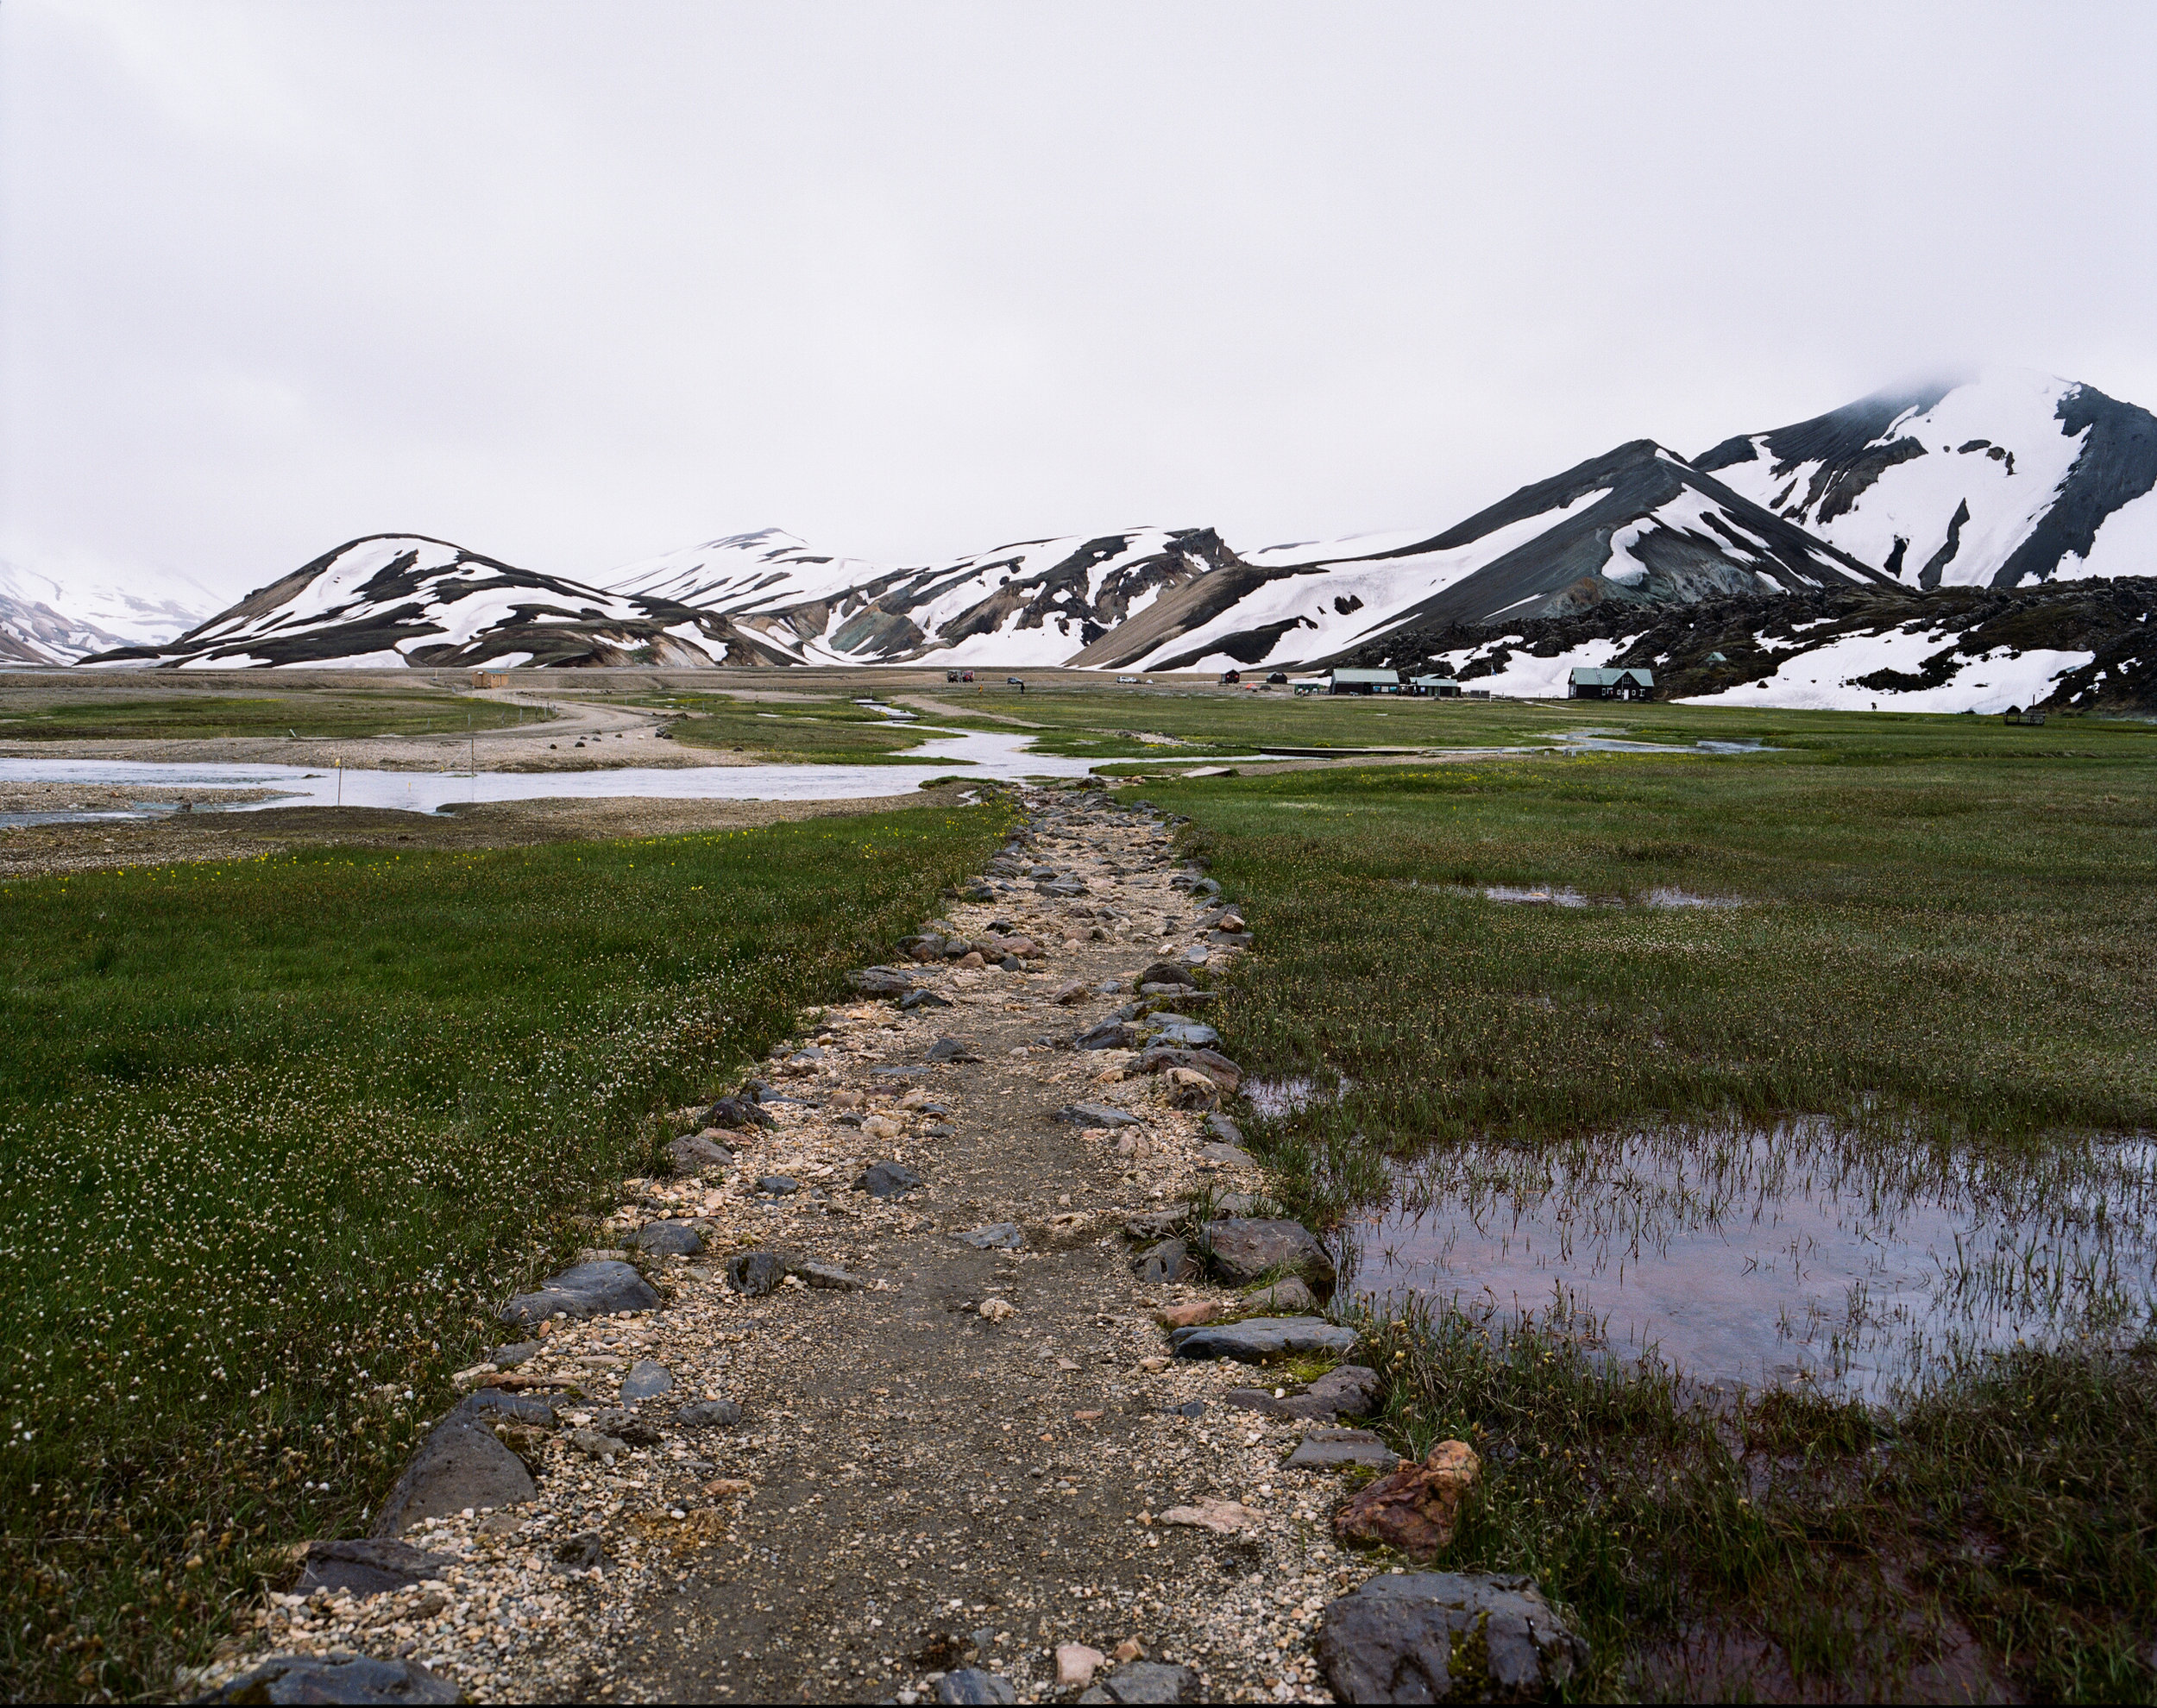 F&S_ICELAND_UNRETOUCHED_DANIELALEXANDERHARRIS_000029300002.jpg